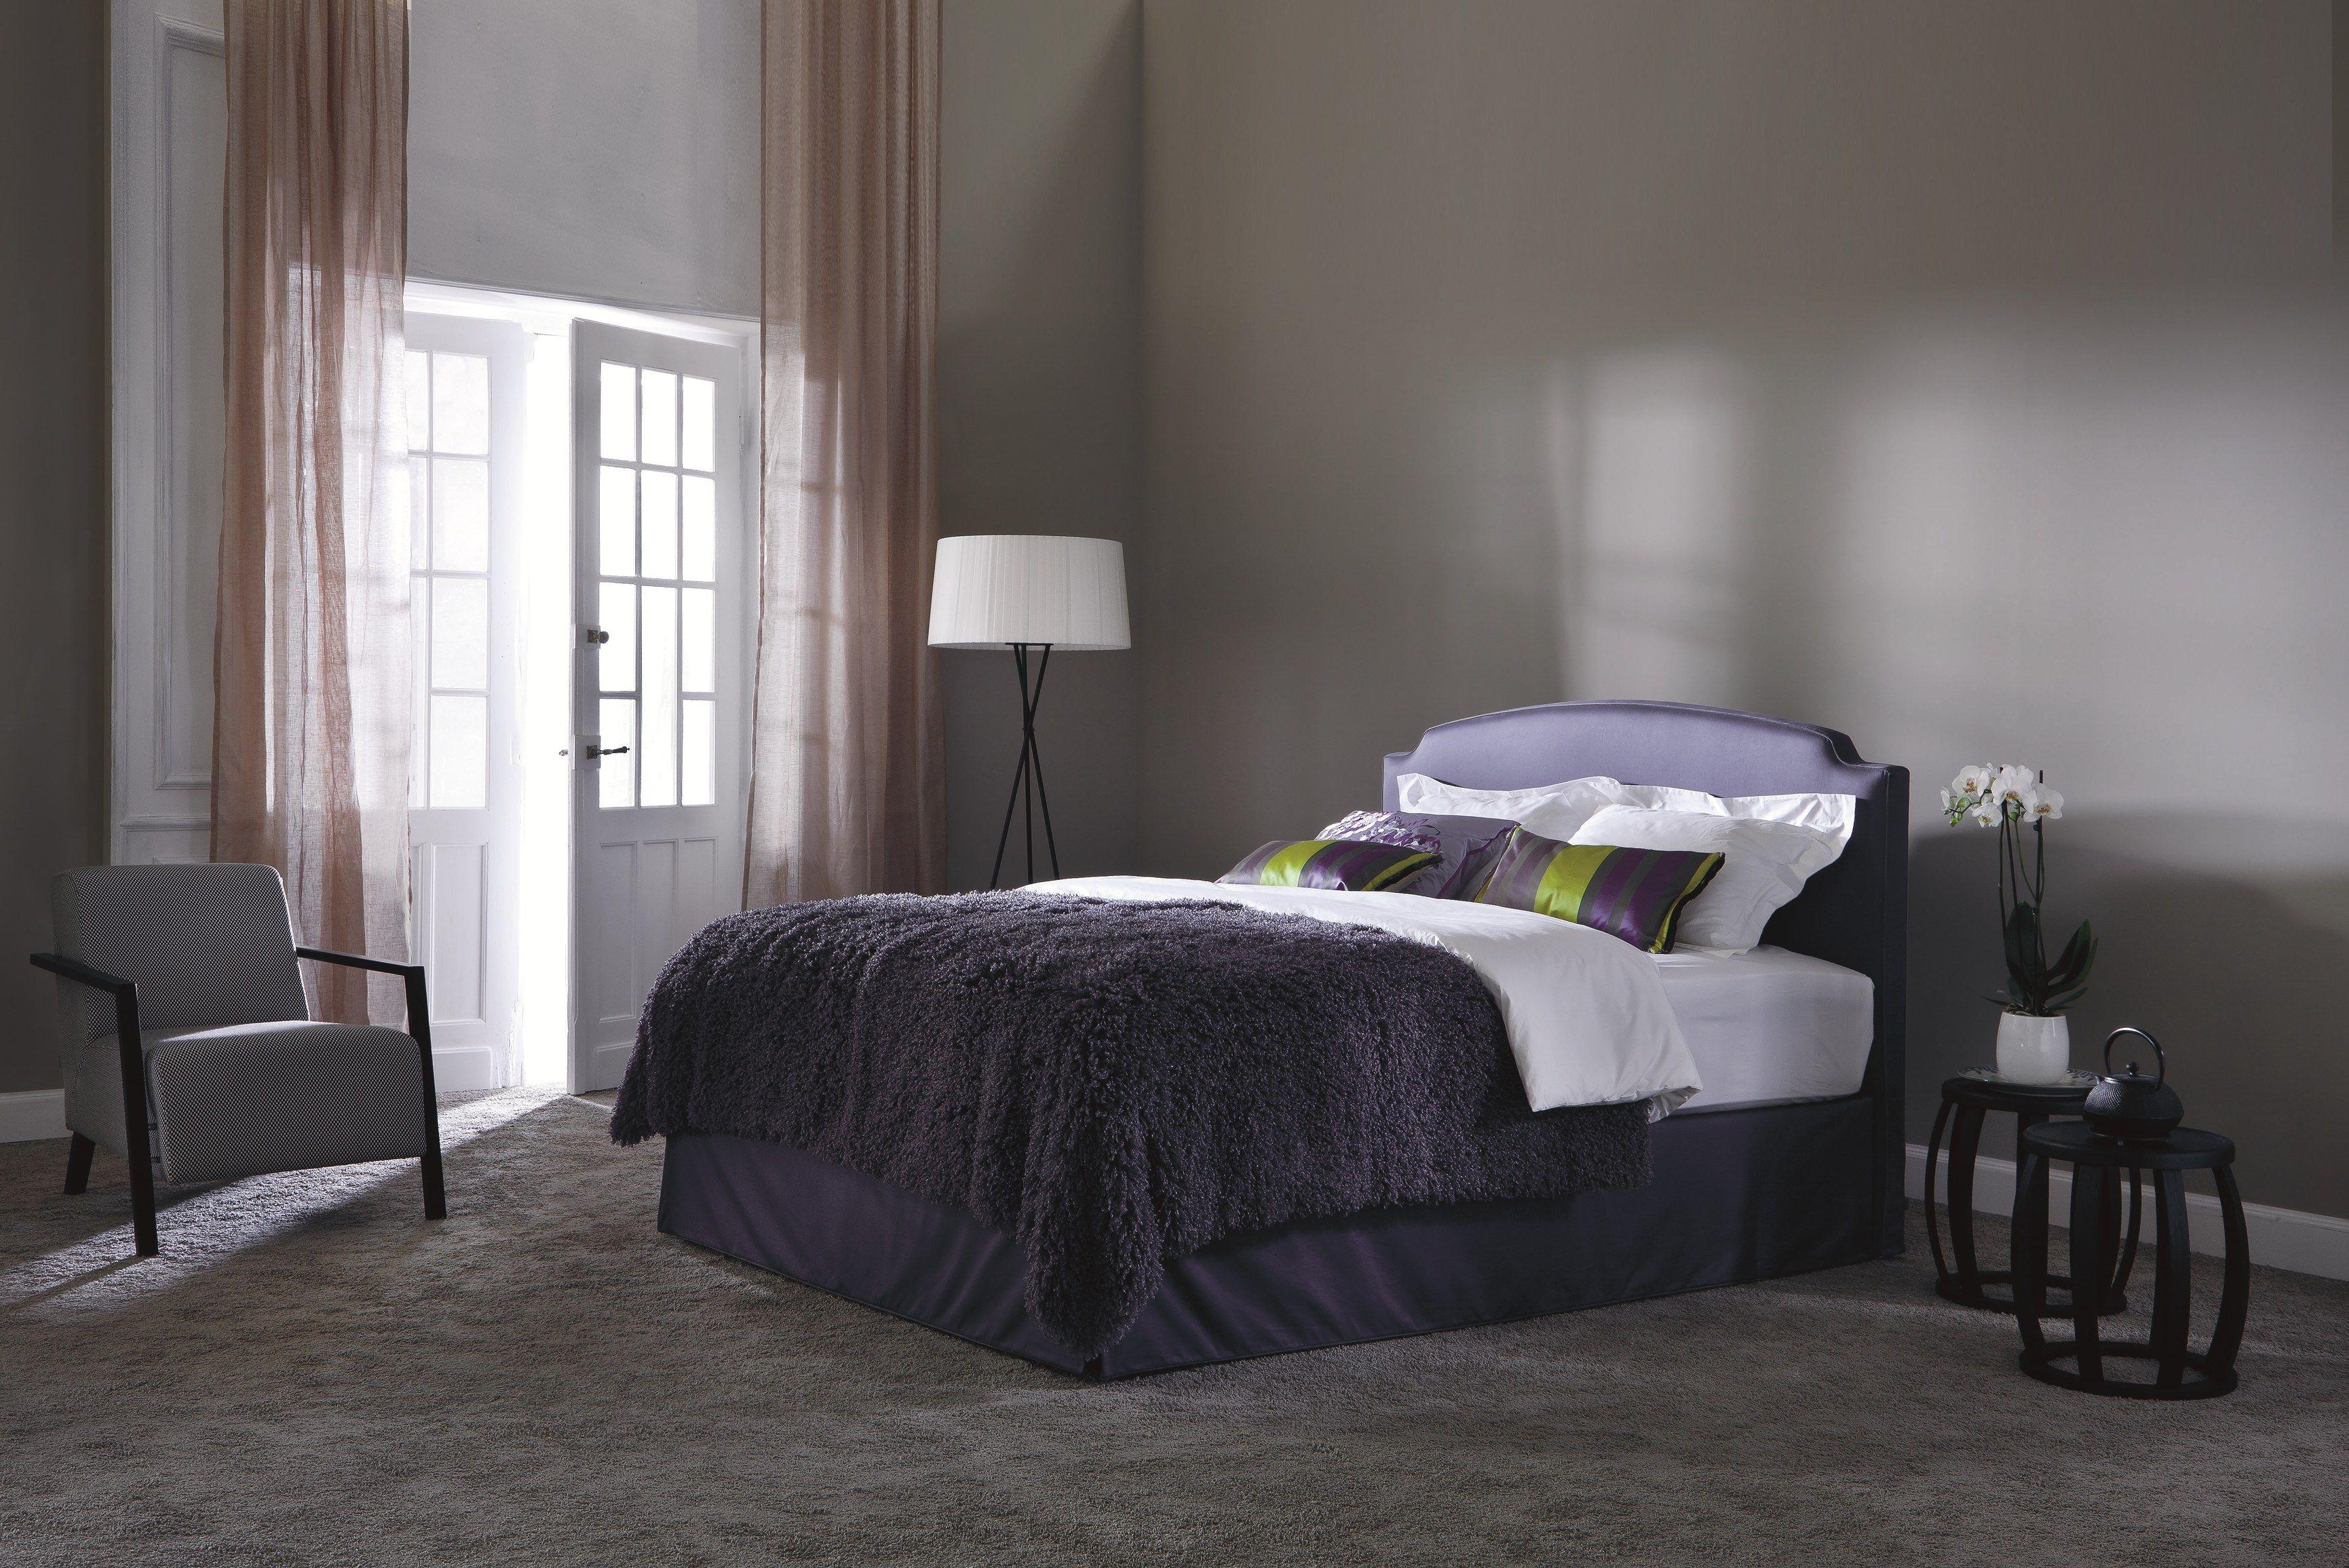 letto matrimoniale sfoderabile con testiera imbottita basis 25 louis xvi by schramm werkst tten. Black Bedroom Furniture Sets. Home Design Ideas